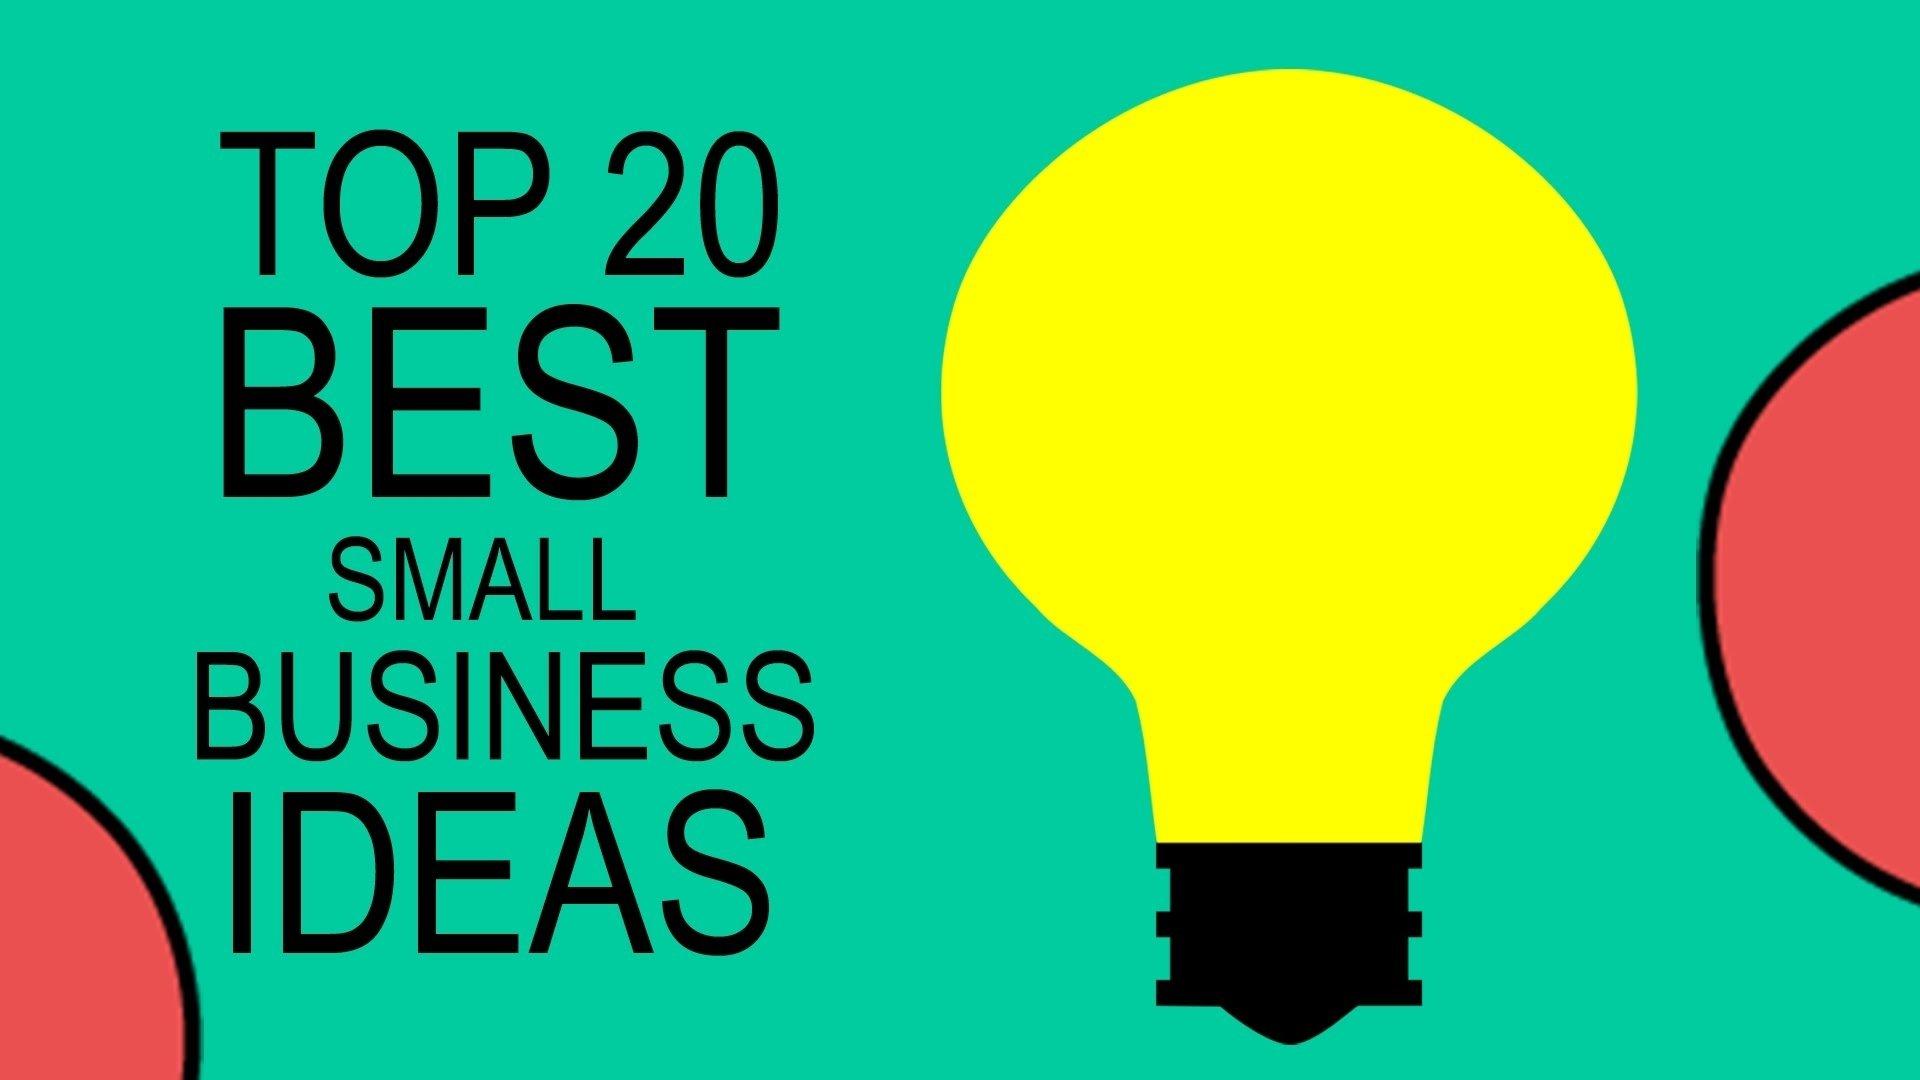 10 Stunning Best New Small Business Ideas top 20 best small business ideas for beginners in 2017 youtube 9 2021